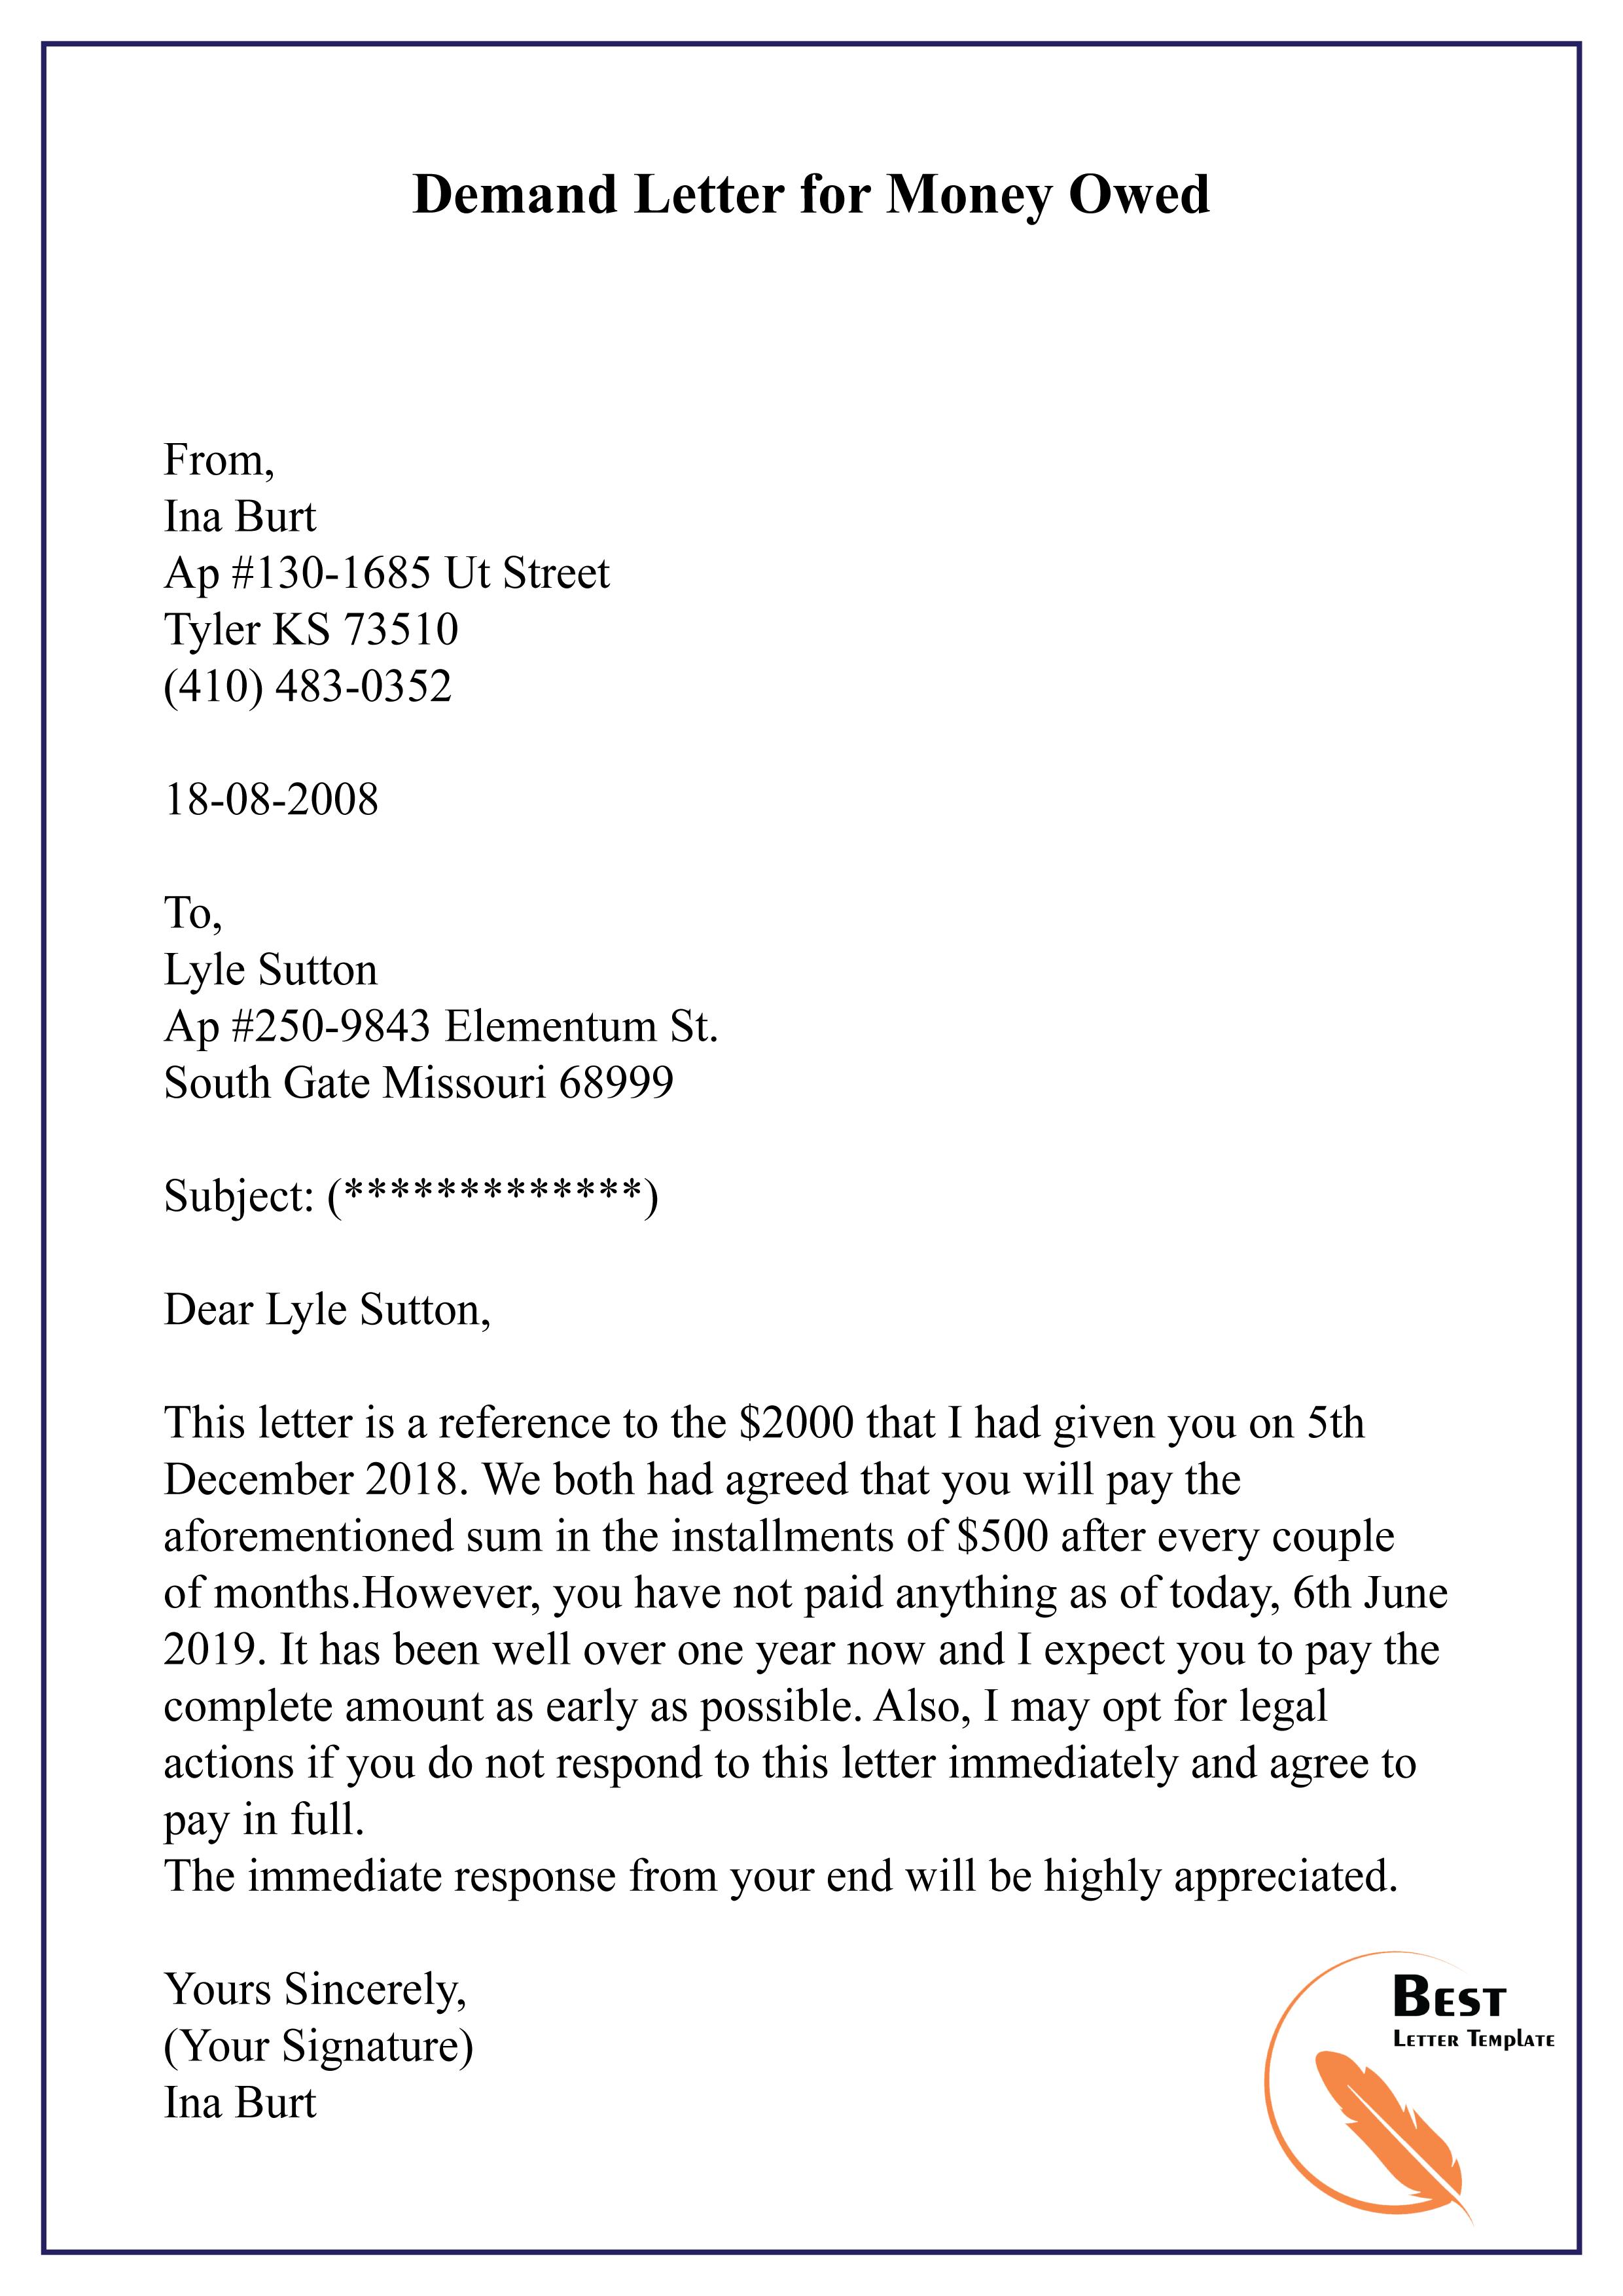 Demand Letter For Money Owed Sample from bestlettertemplate.com